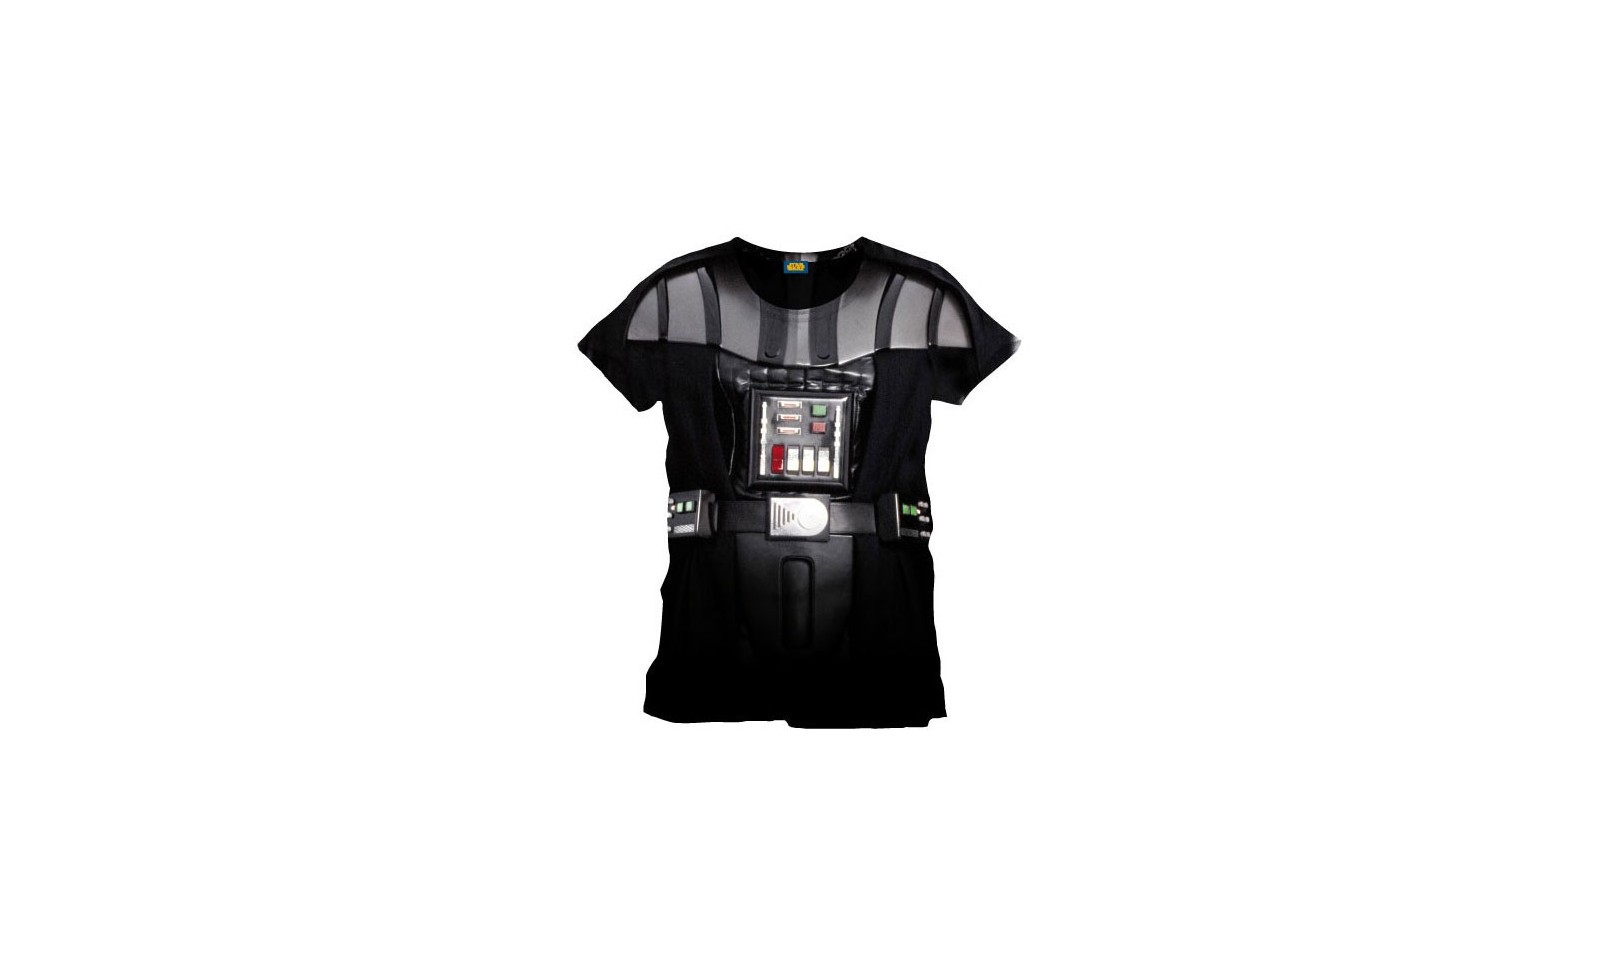 star wars t shirt costume dark vador d guisement adulte cosplay cin ma roleplay film. Black Bedroom Furniture Sets. Home Design Ideas